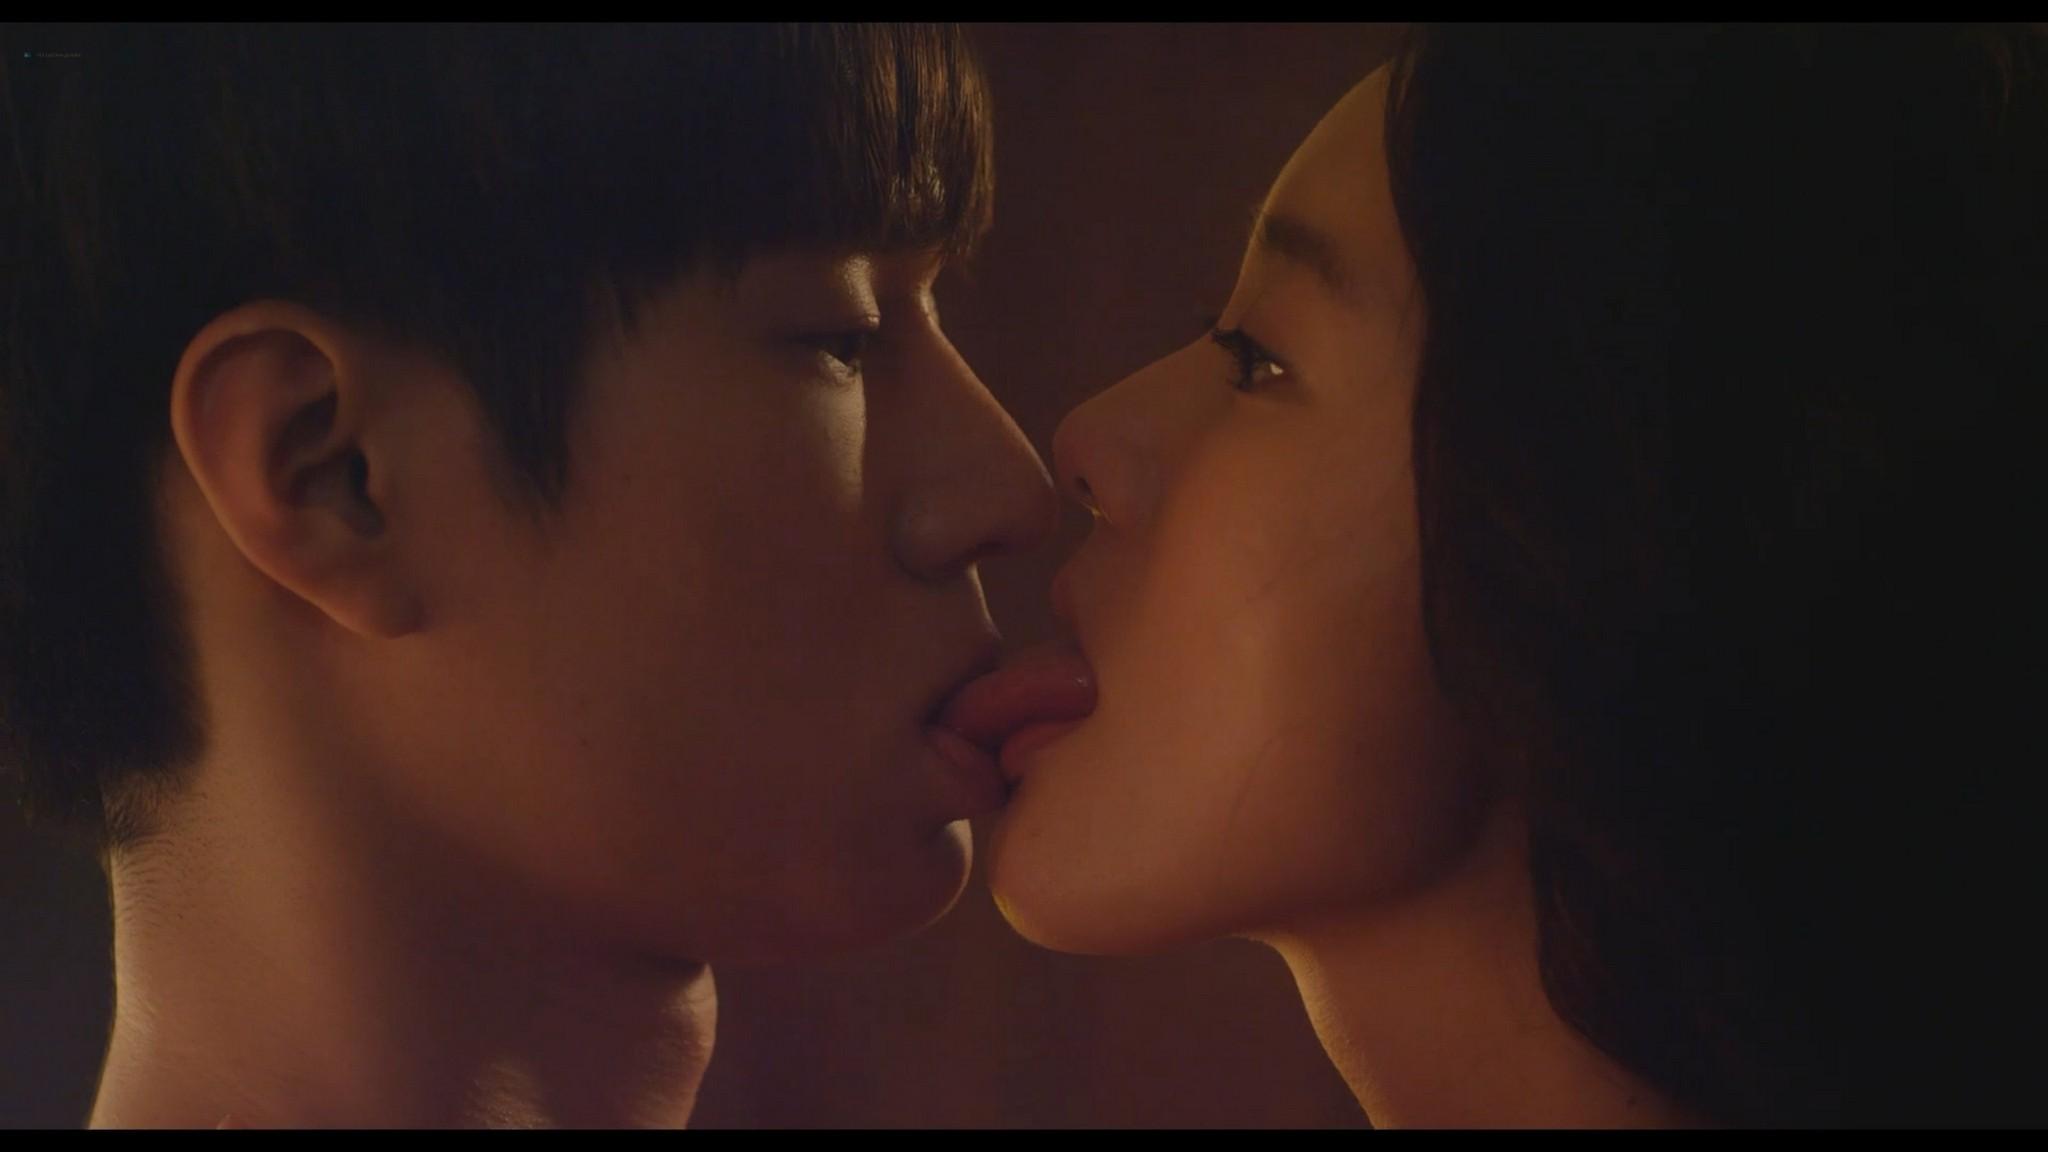 Yeo jeong Cho nude Clara Lee sexy Casa Amor Exclusive for Ladies 2015 1080p BluRay 11